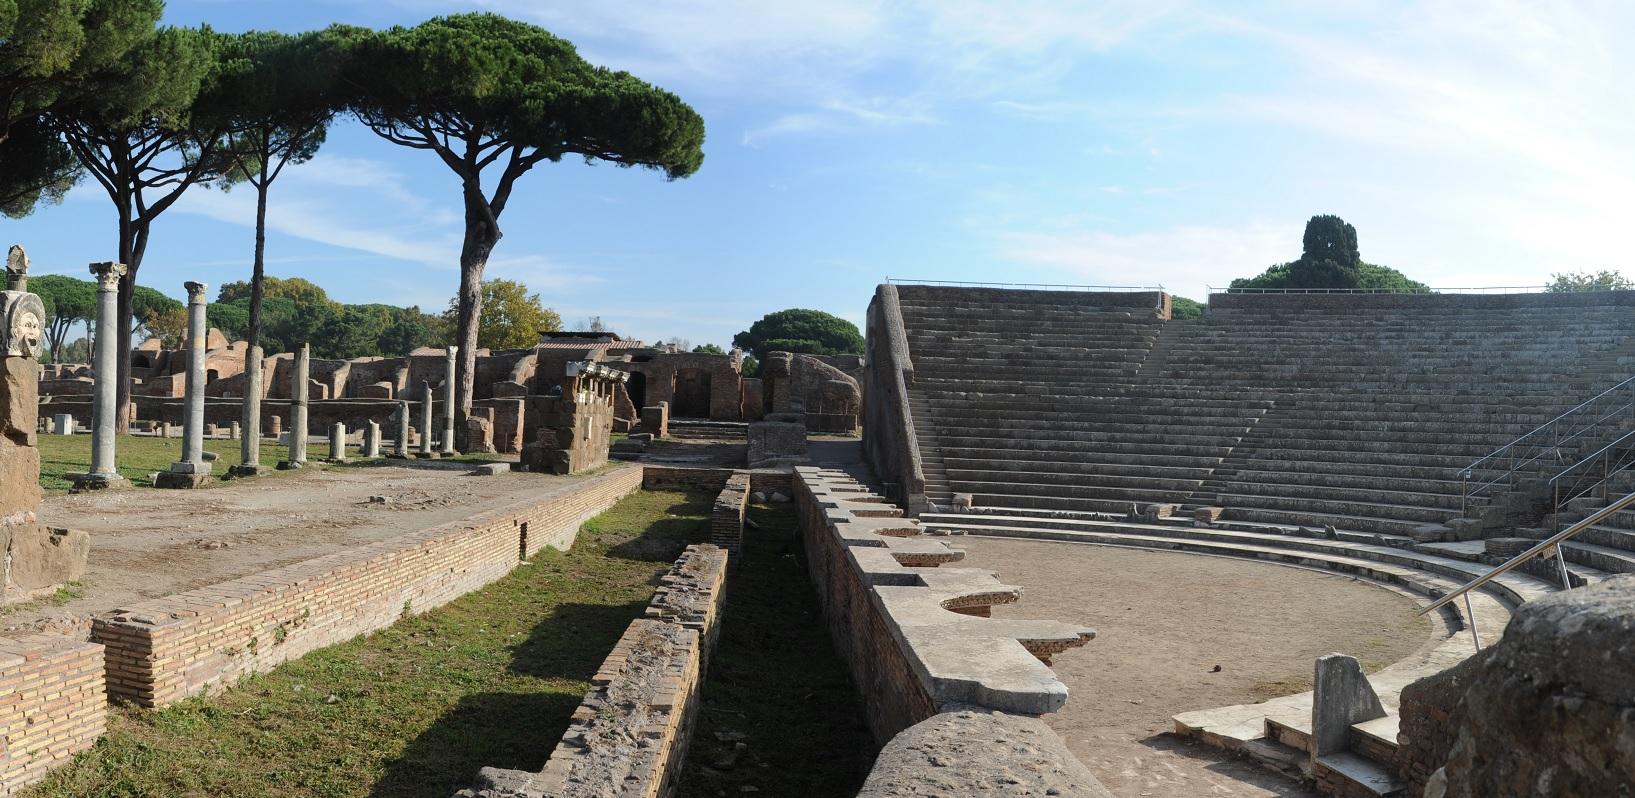 itinerario roma 3 giorni archeologia ostia antica